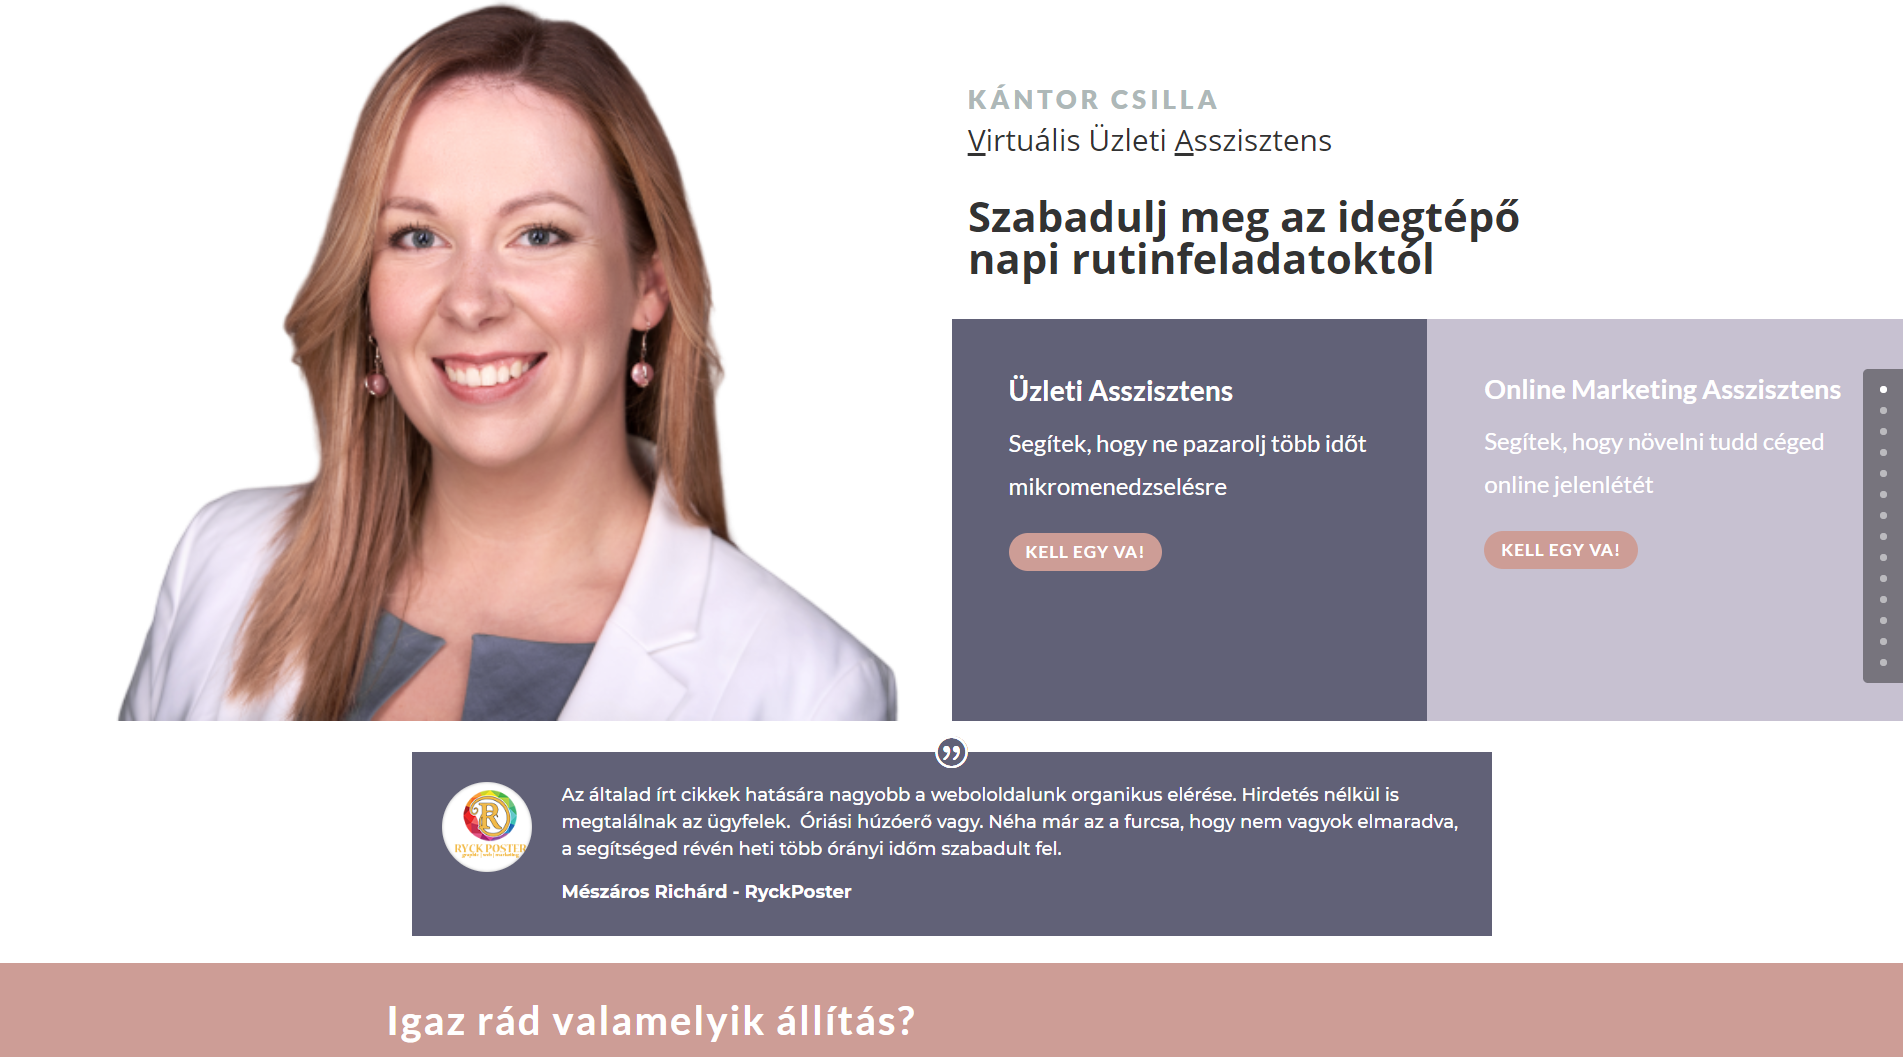 csillassist.com